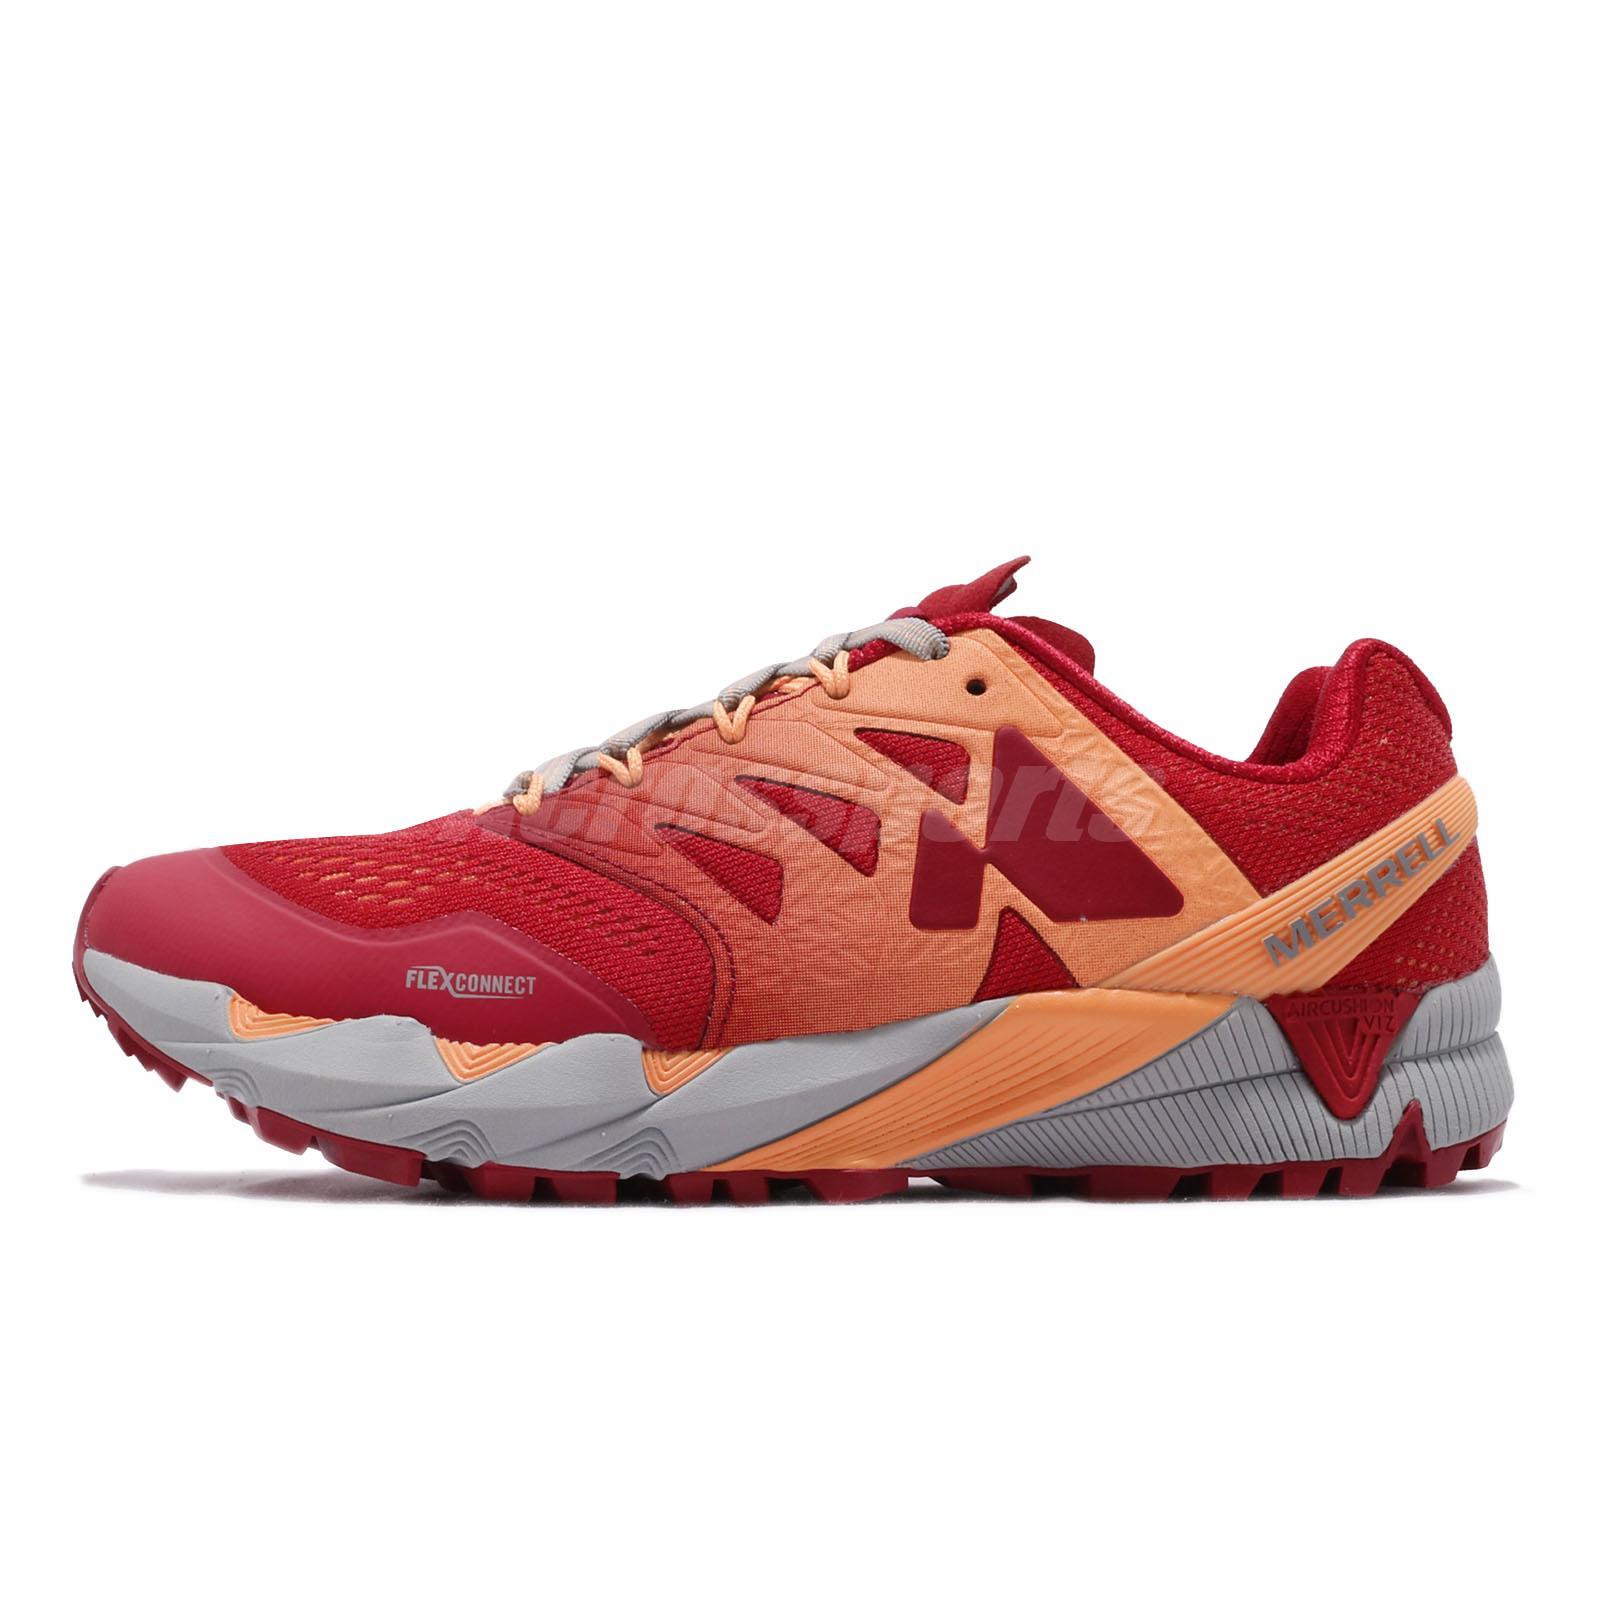 fe72f71ab246f Details about Merrell Agility Peak Flex 2 E-Mesh Pepper Red Womens Trail  Running Shoes ML12556